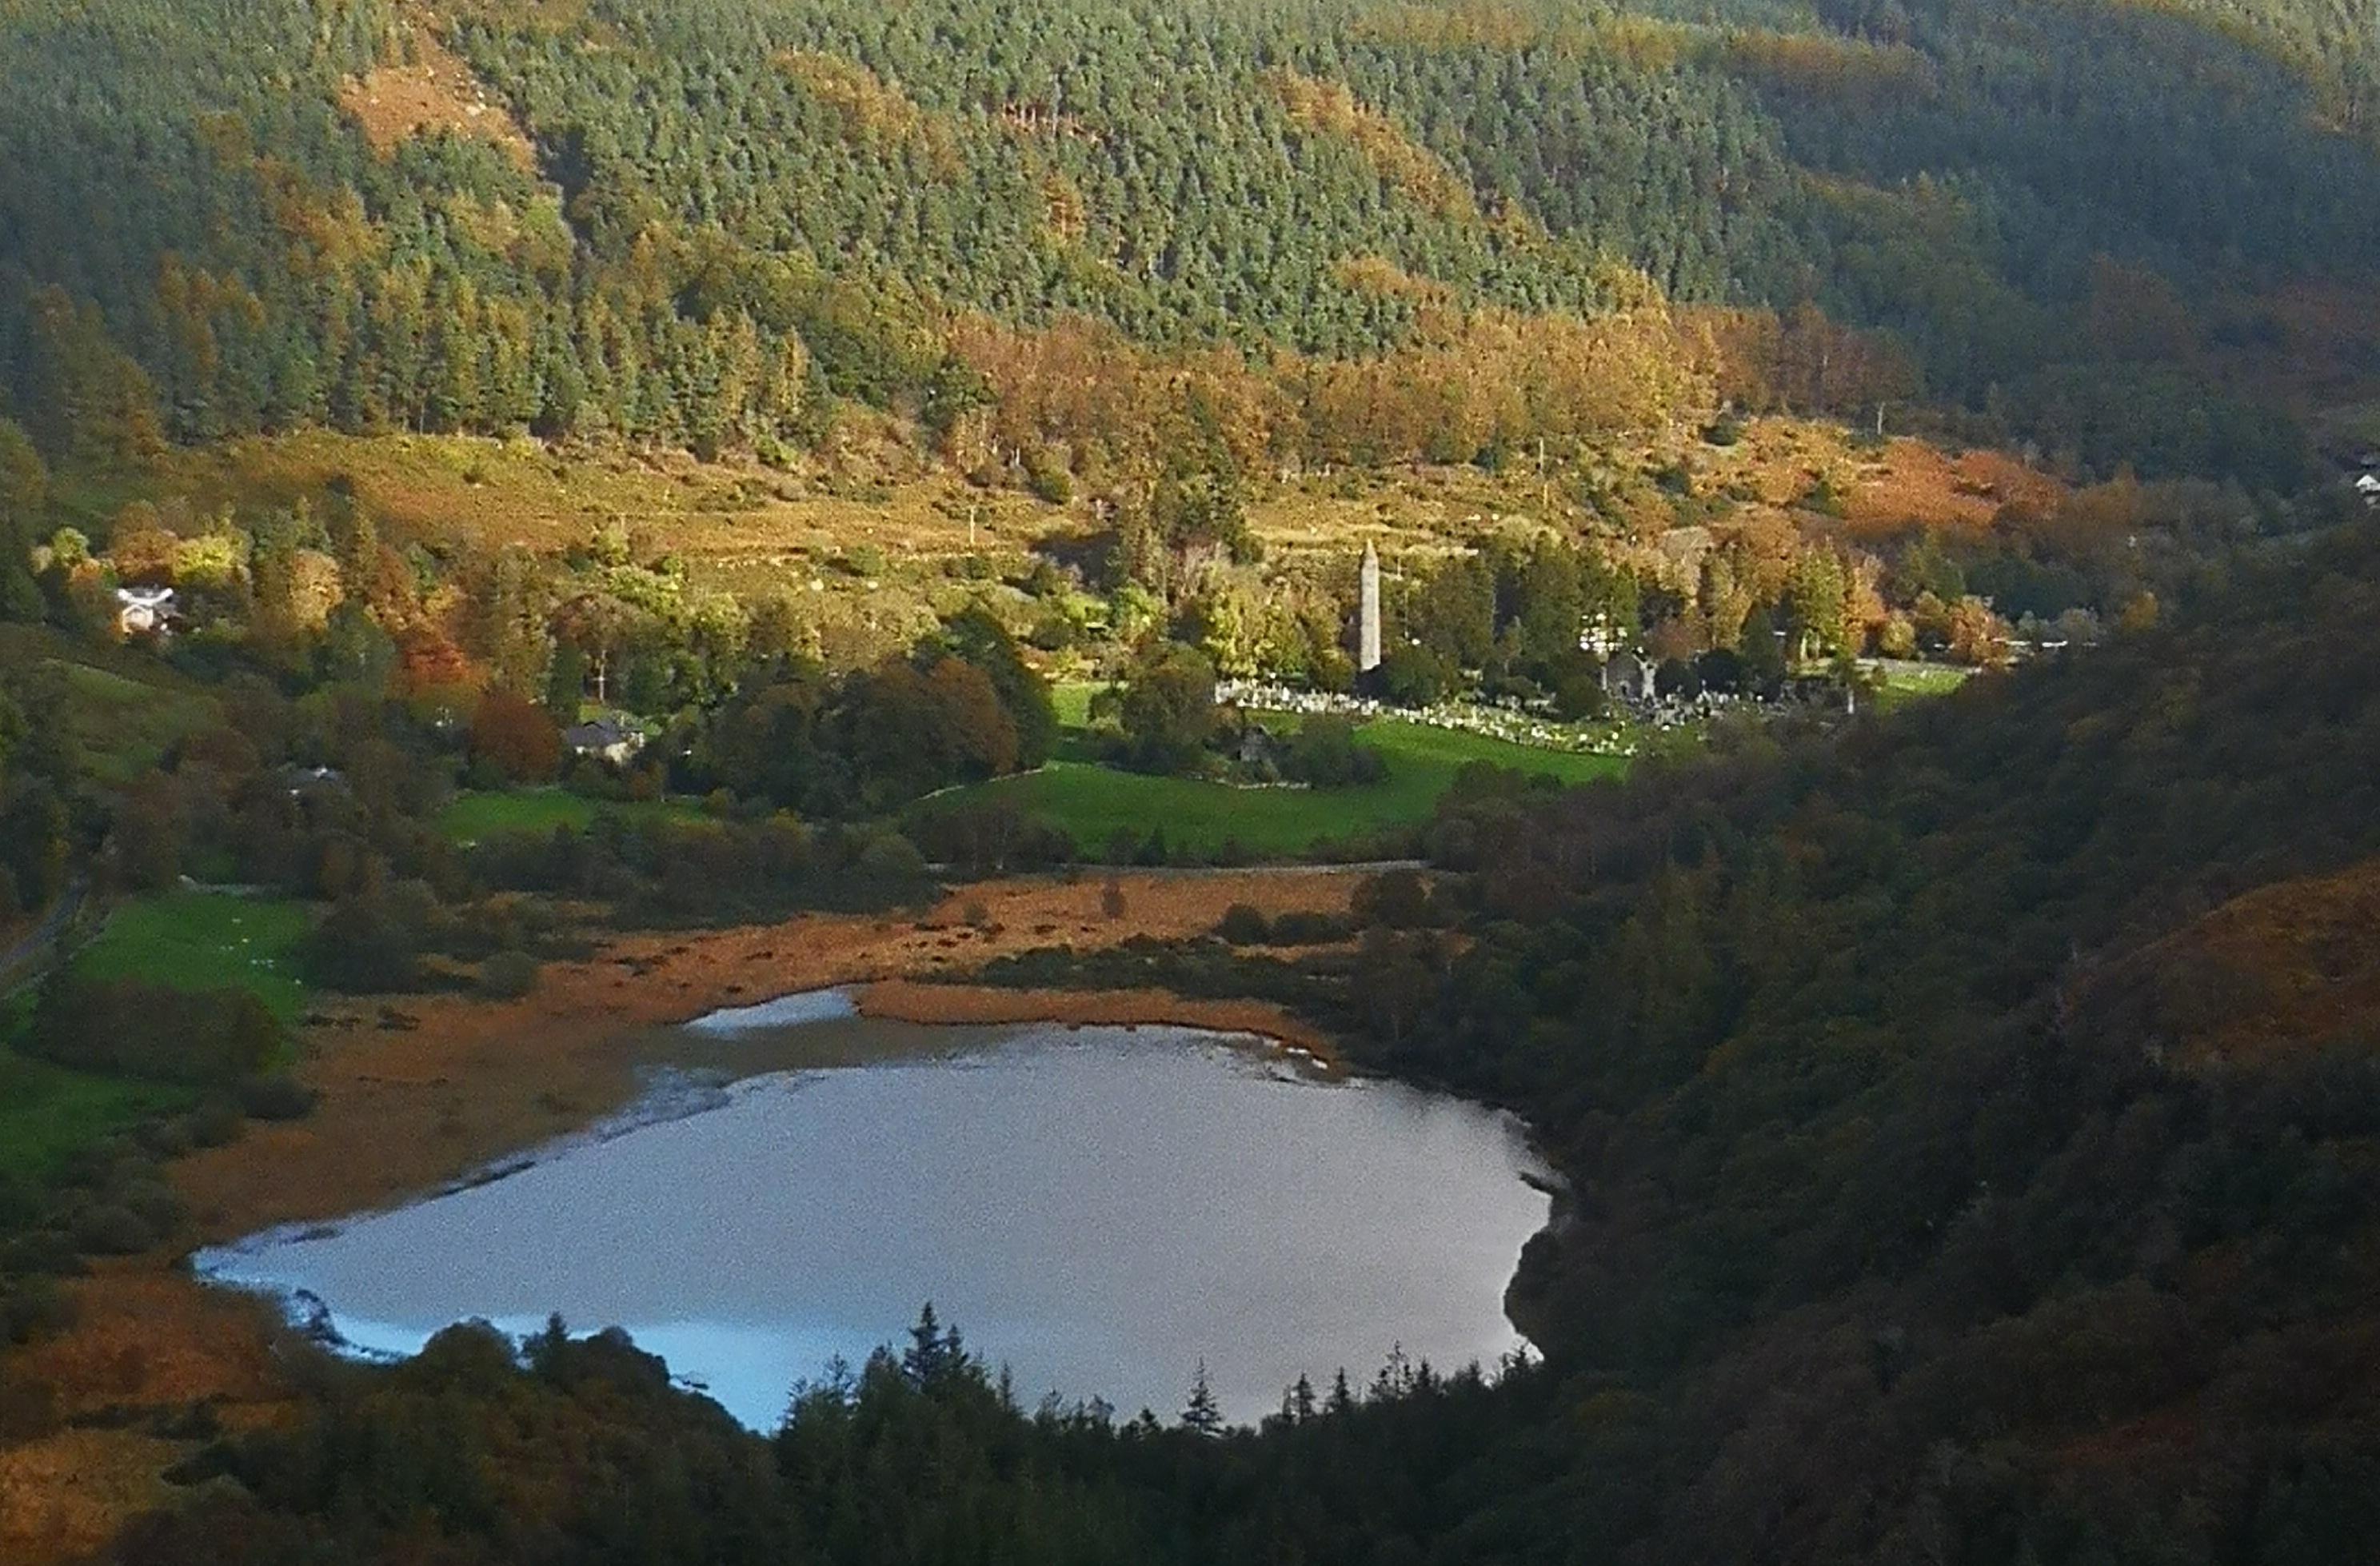 Camino, Coastal Tours Waterford, Guided, Guided Tours, Ireland, Mountains Waterford, Tours, Waterford, Waterford Camino, Journeying, Pilgrim, Walk